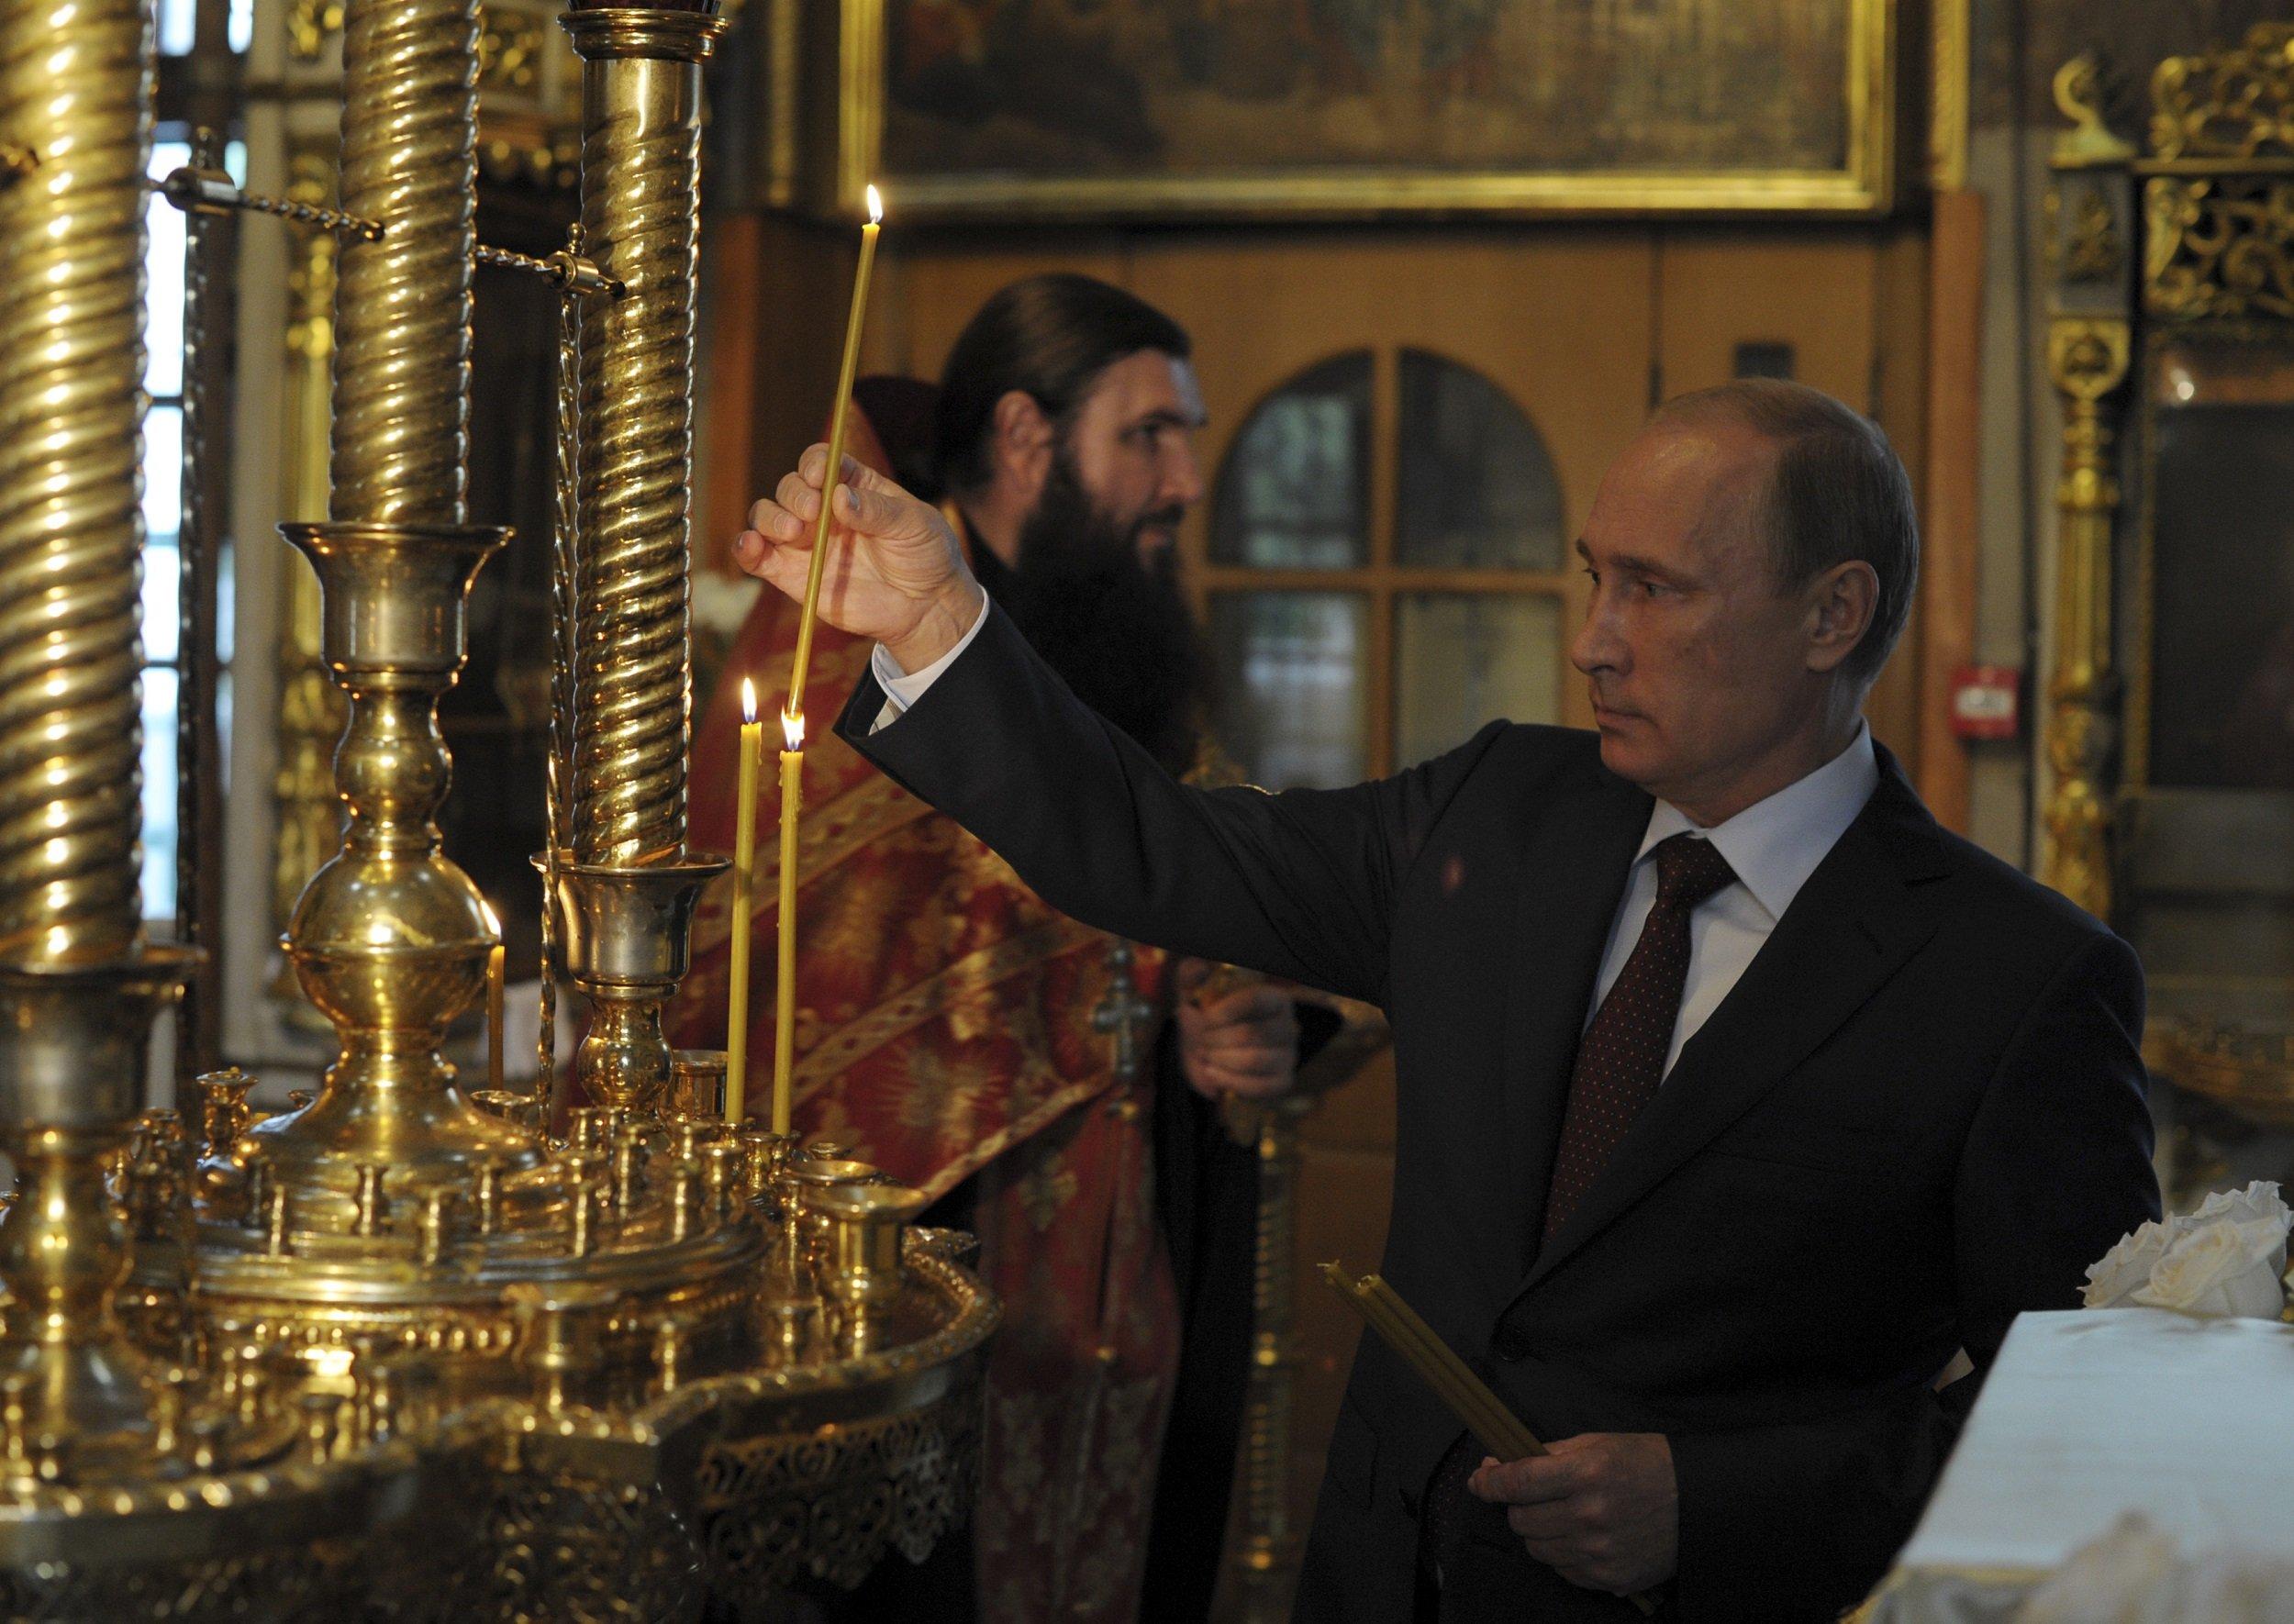 Putin ICBM test